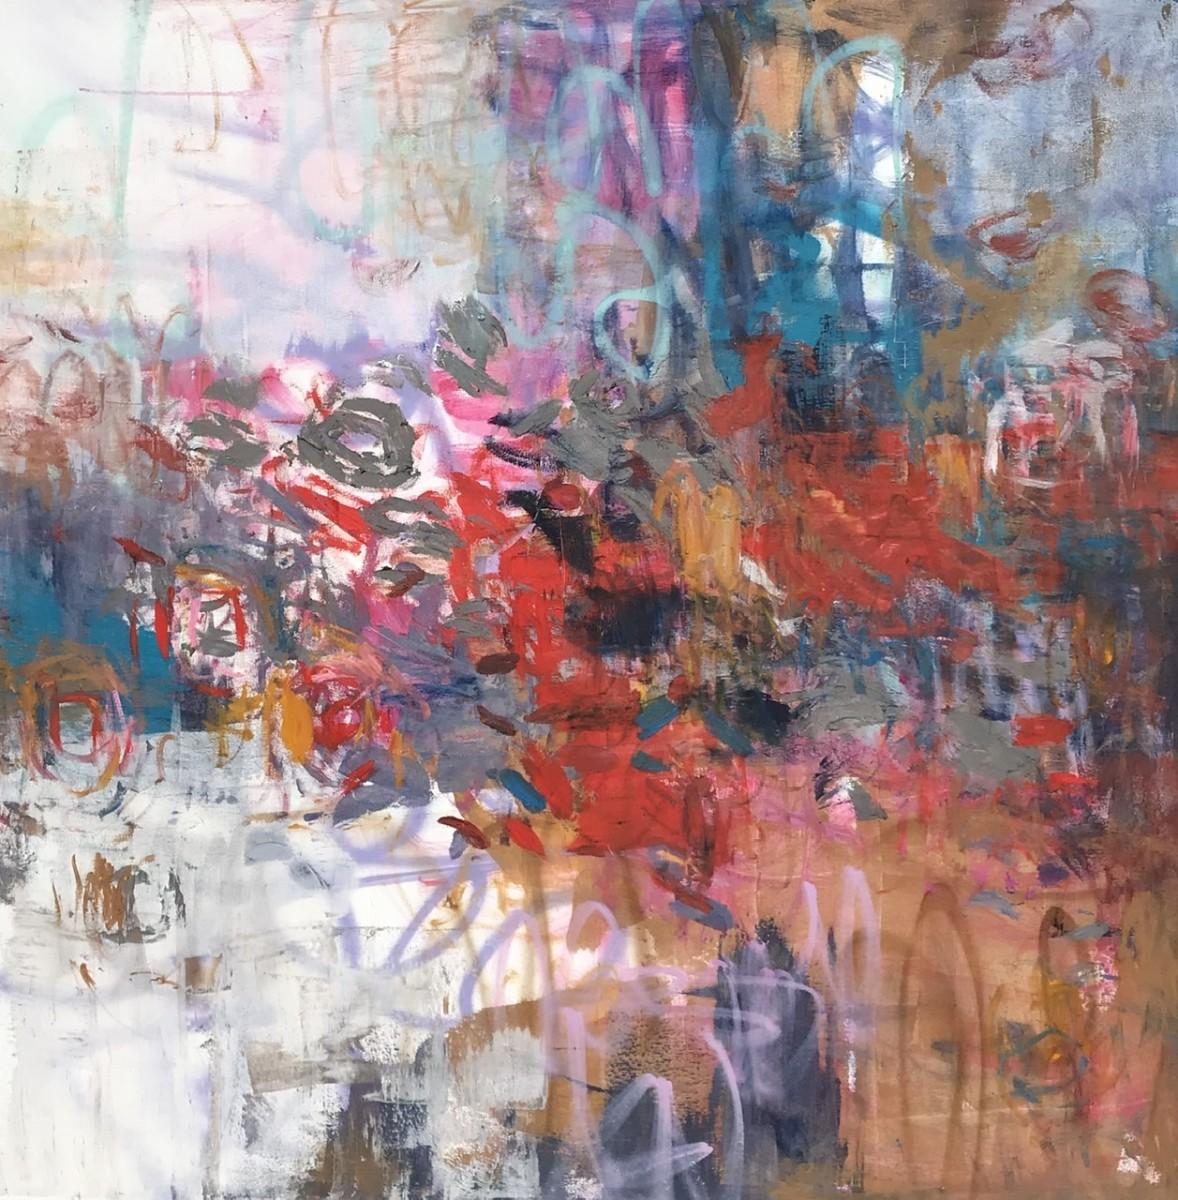 Freedom by AMY DONALDSON